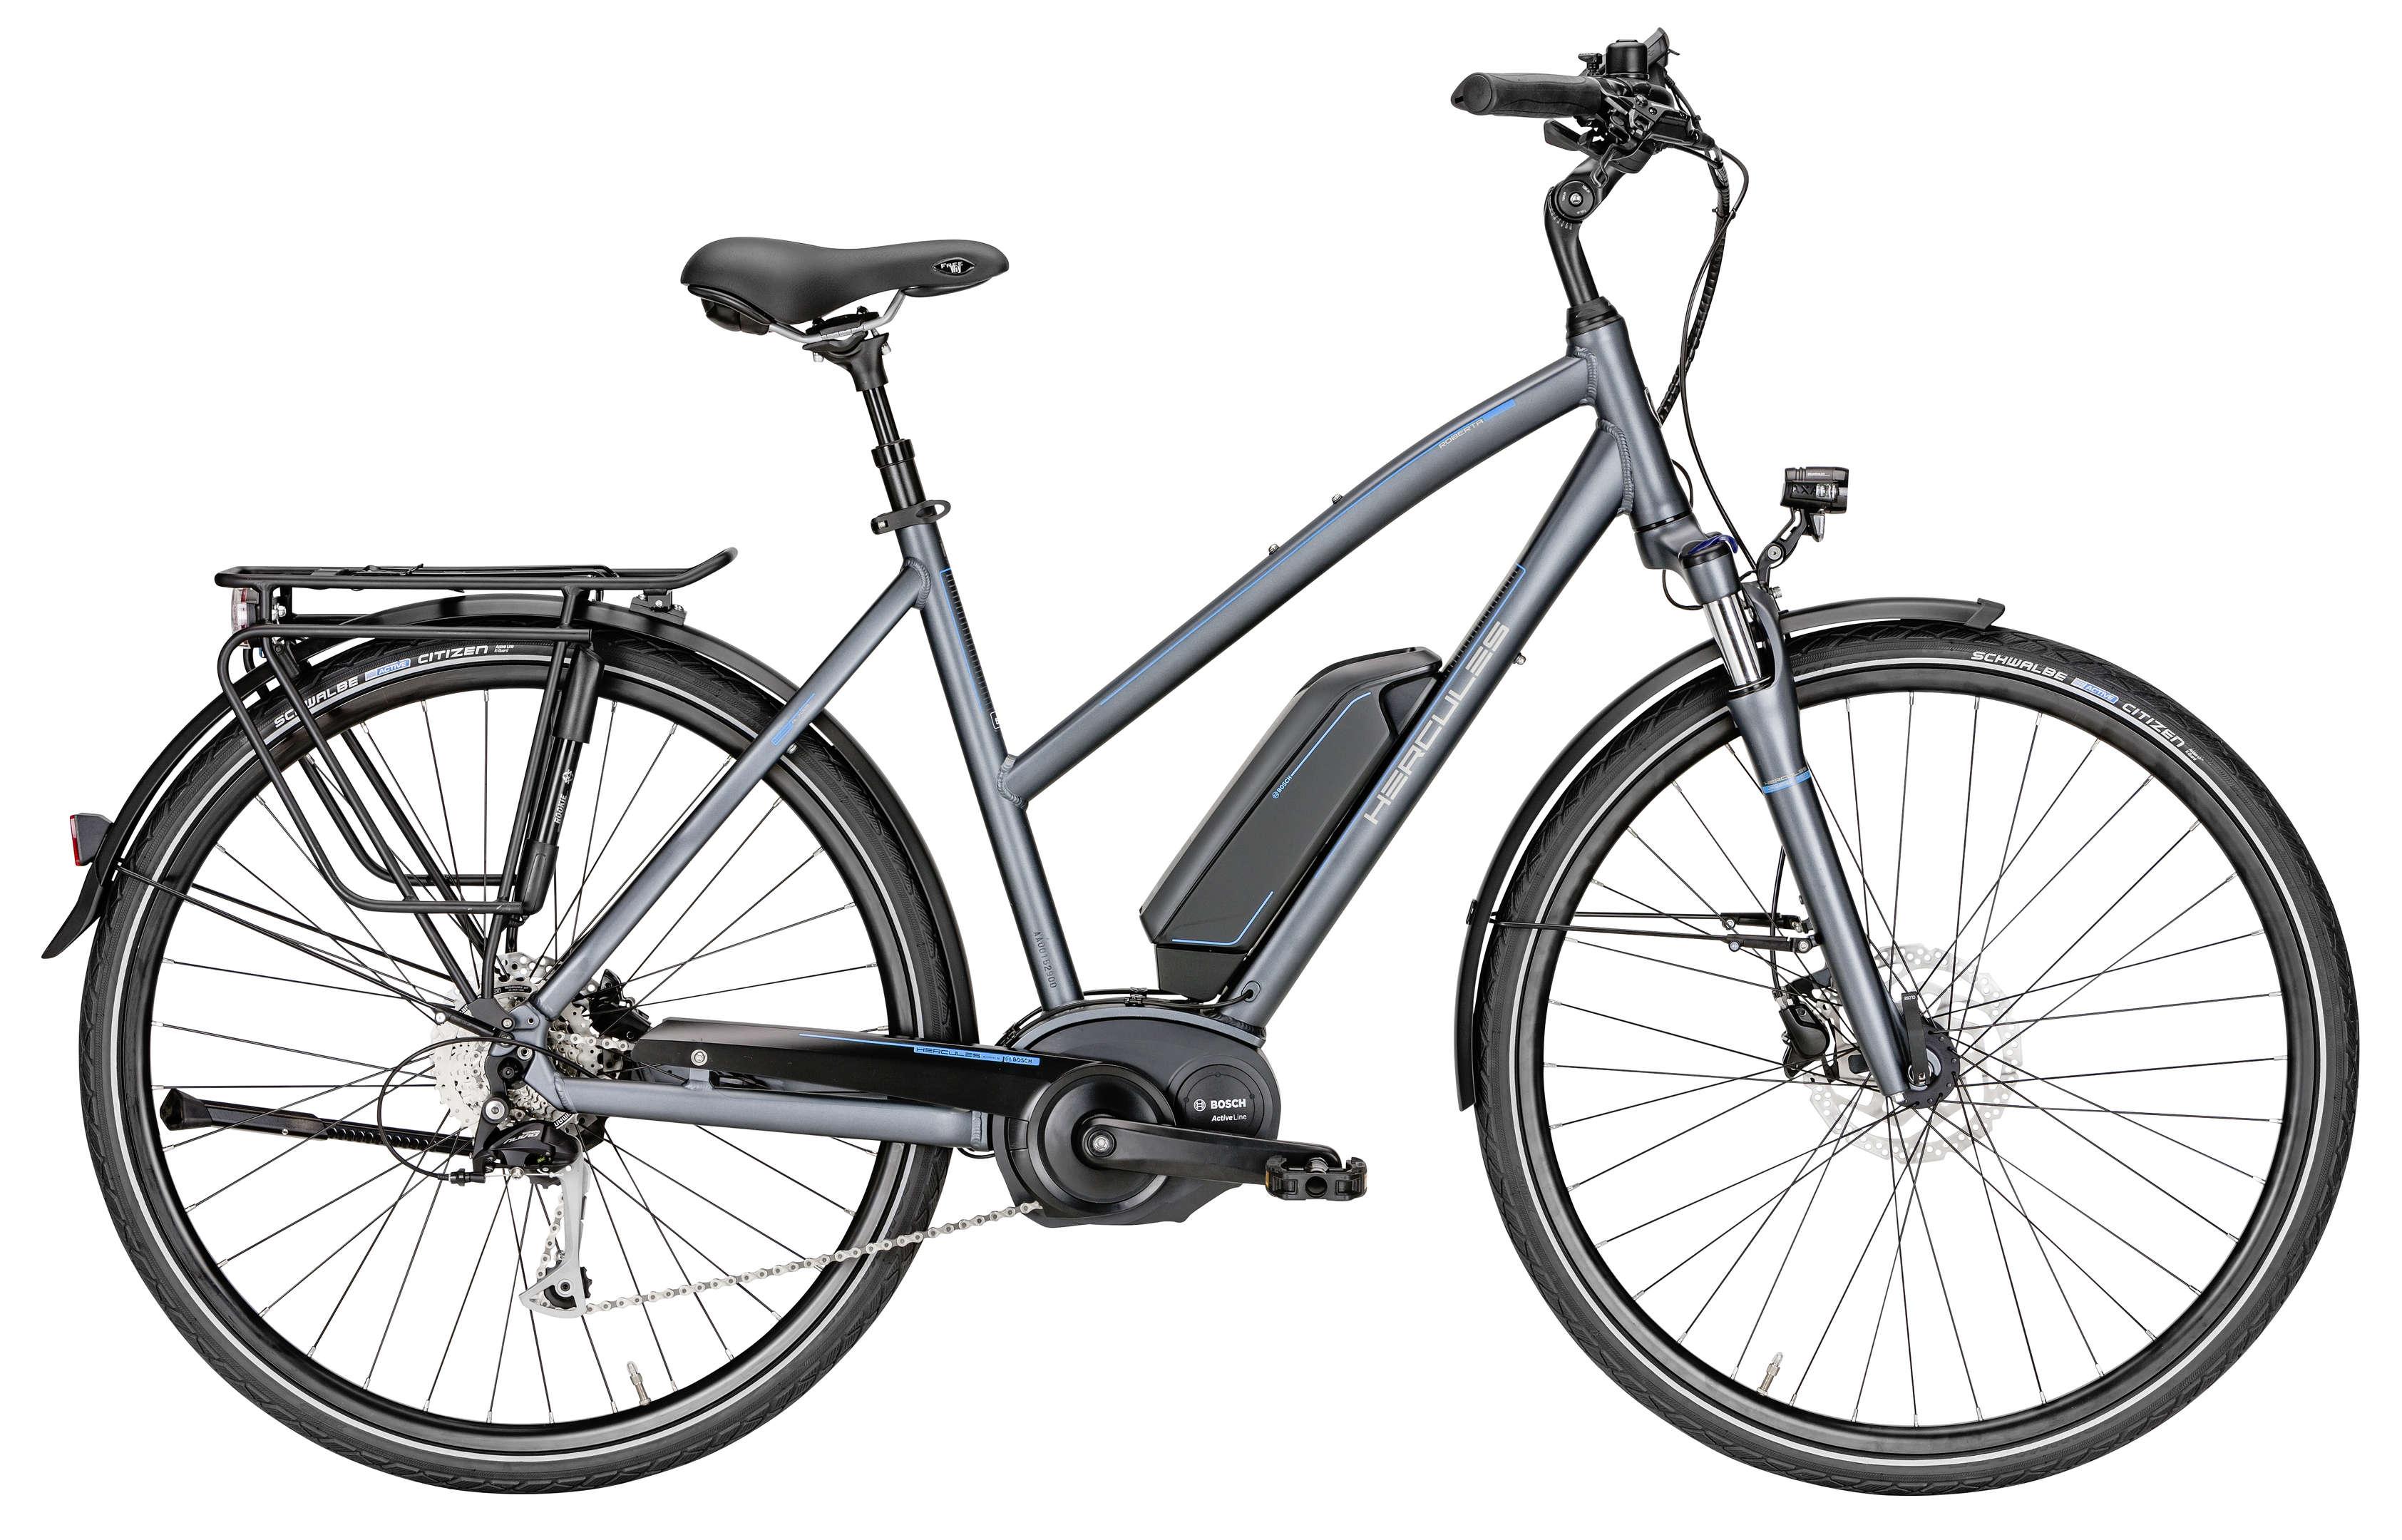 hercules e bike robert a 8 eurorad bikeleasingeurorad bikeleasing. Black Bedroom Furniture Sets. Home Design Ideas